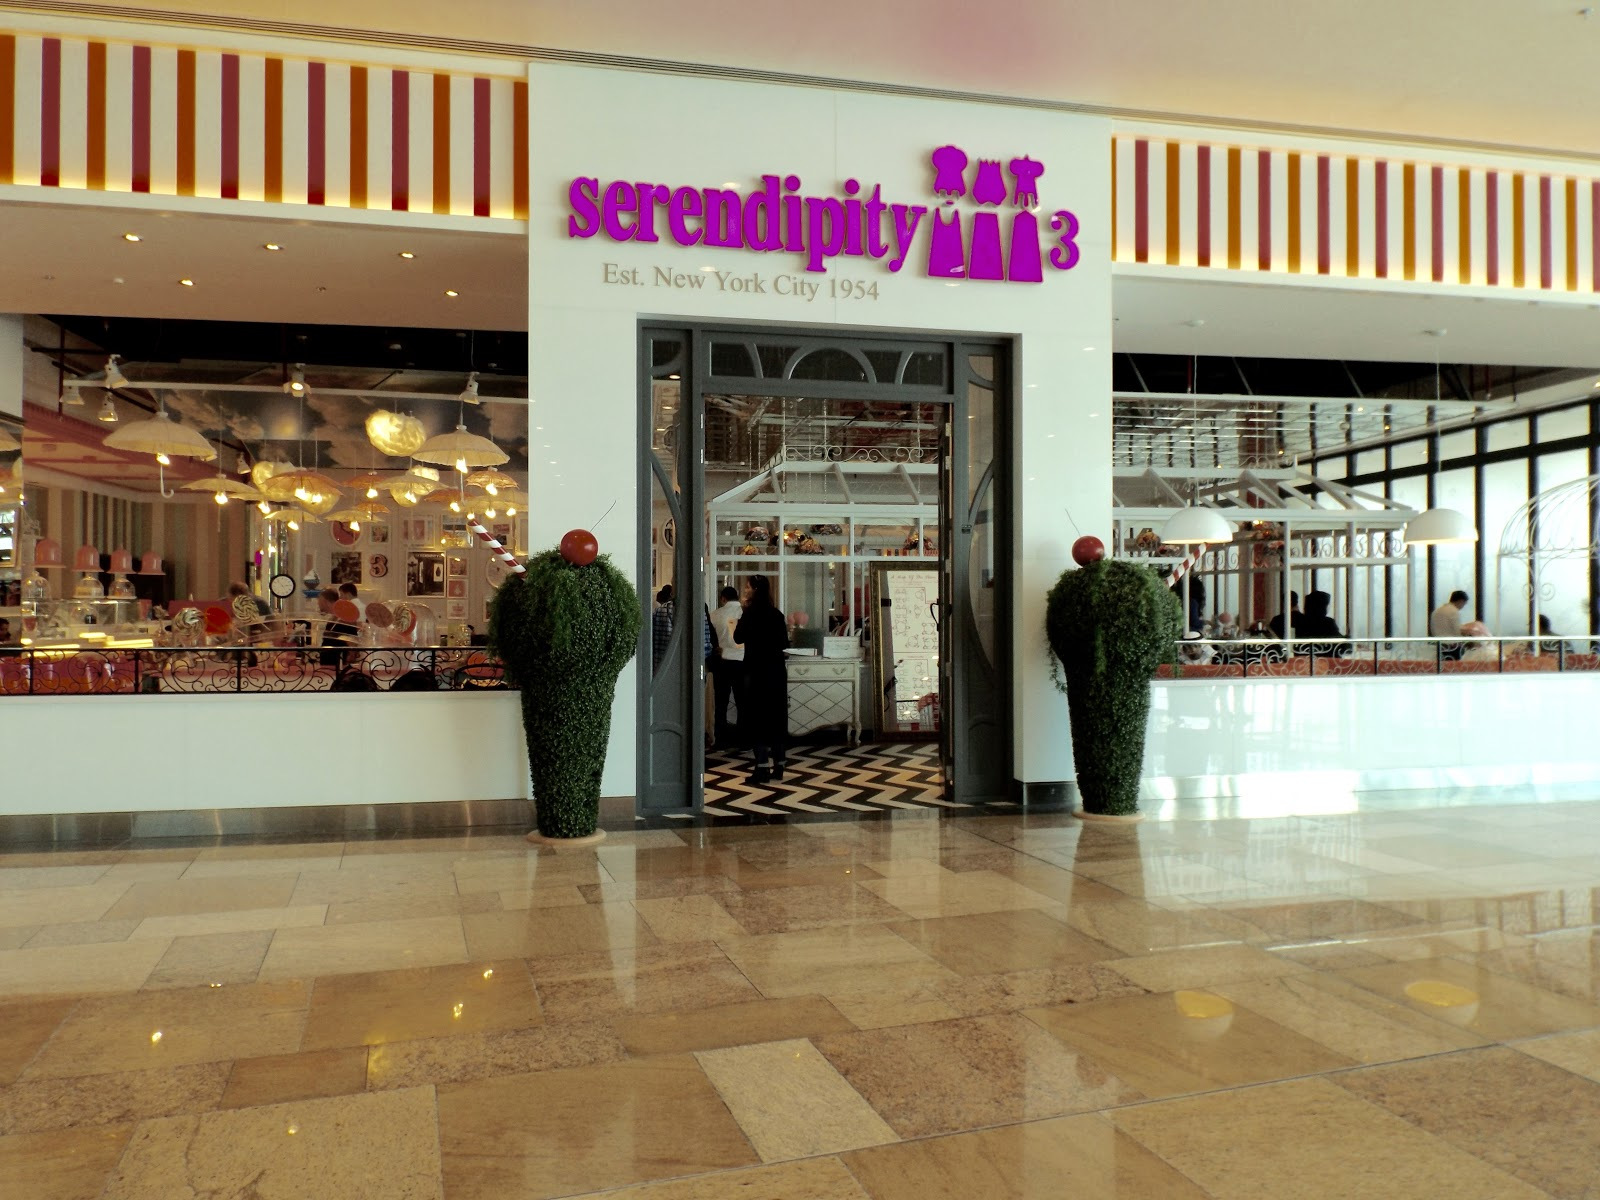 Serendipity 3 in the UAE   Dubai Desert Twins